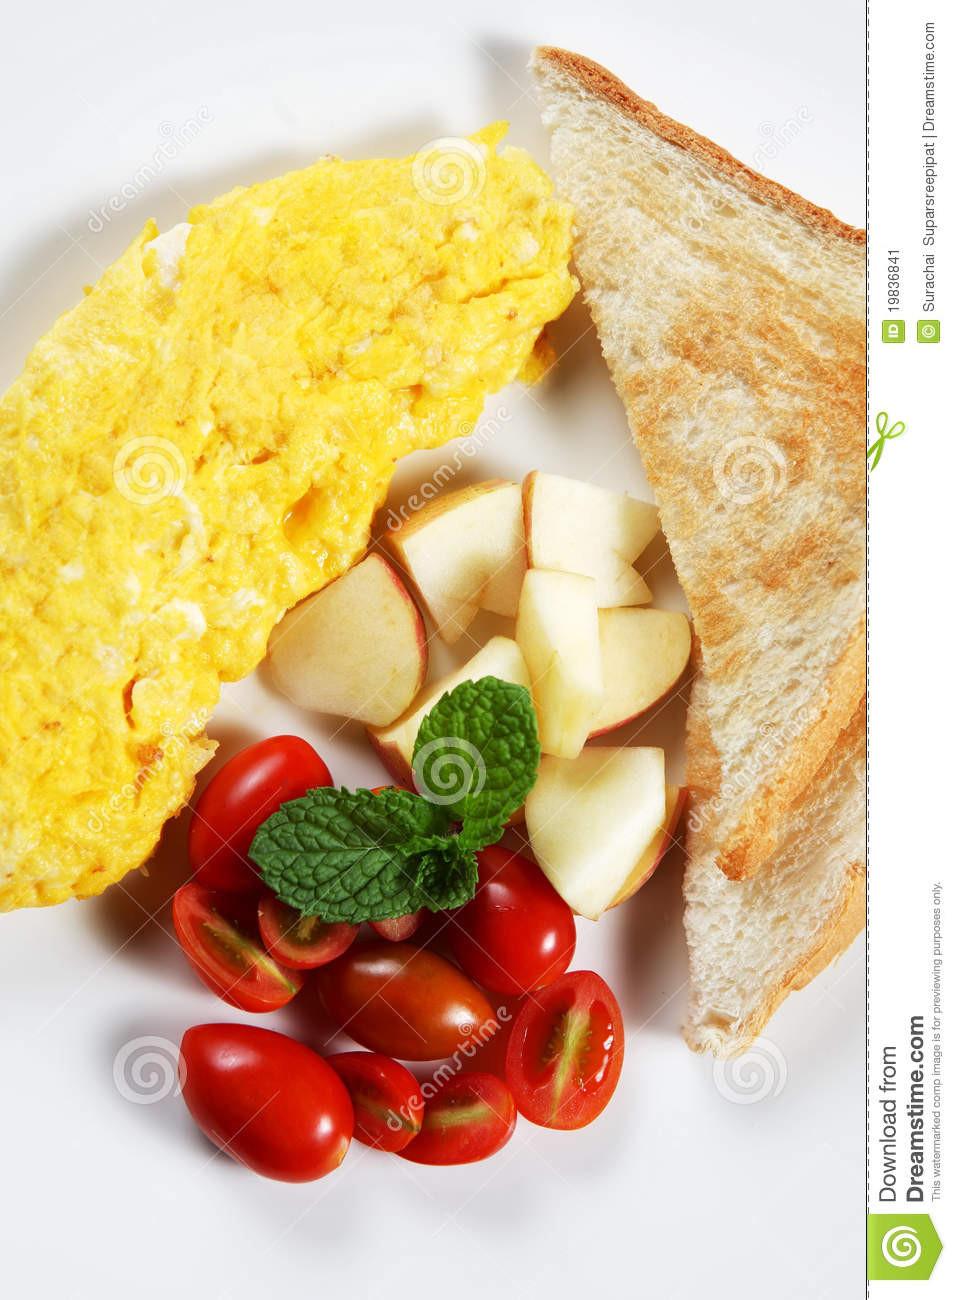 Healthy Low Fat Breakfast  Healthy Low fat Breakfast 03 Stock Image Image